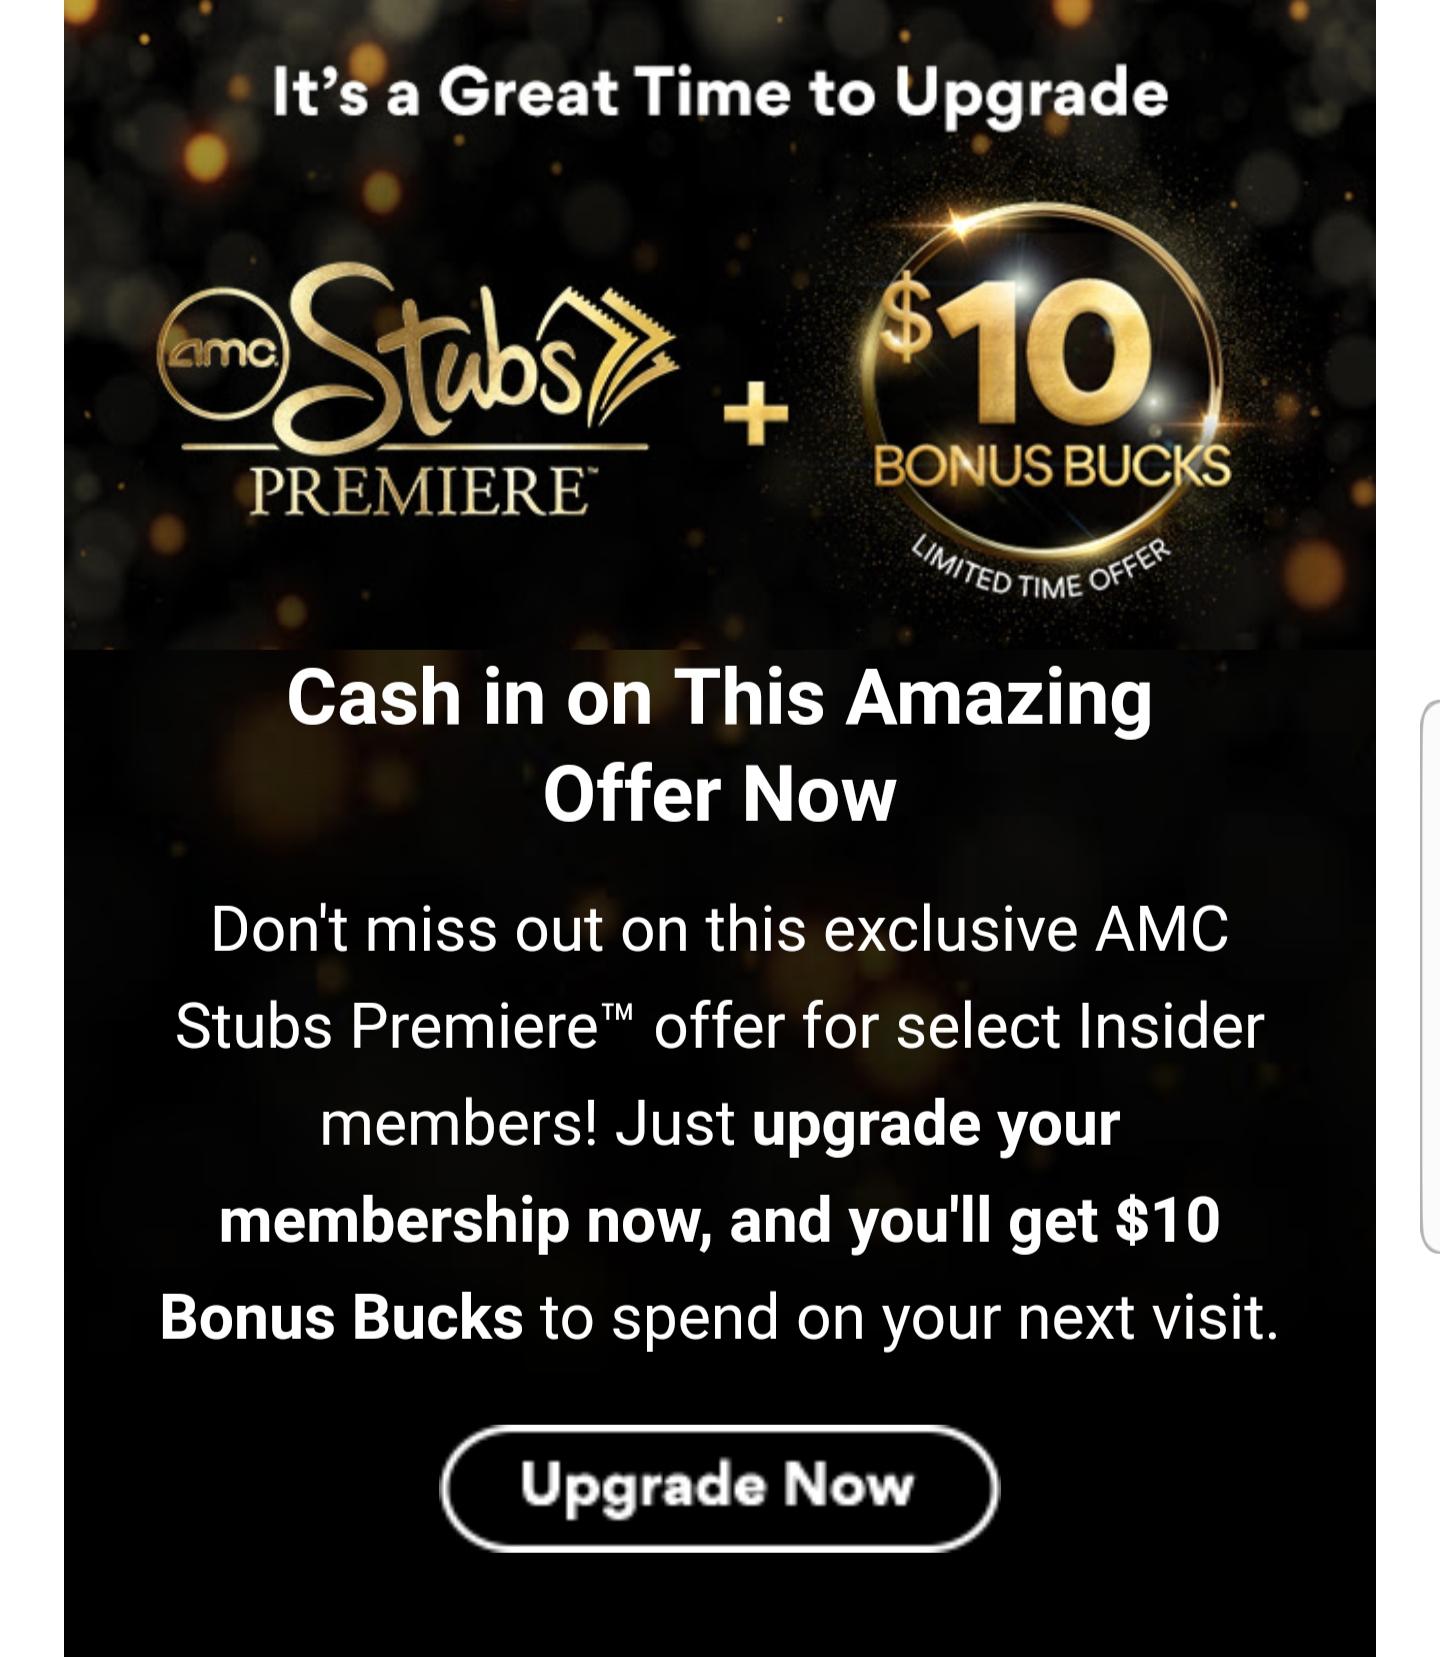 AMC stubs Premier - upgrade and get $10 bonus bucks to sepnd on your next visit - YMMV